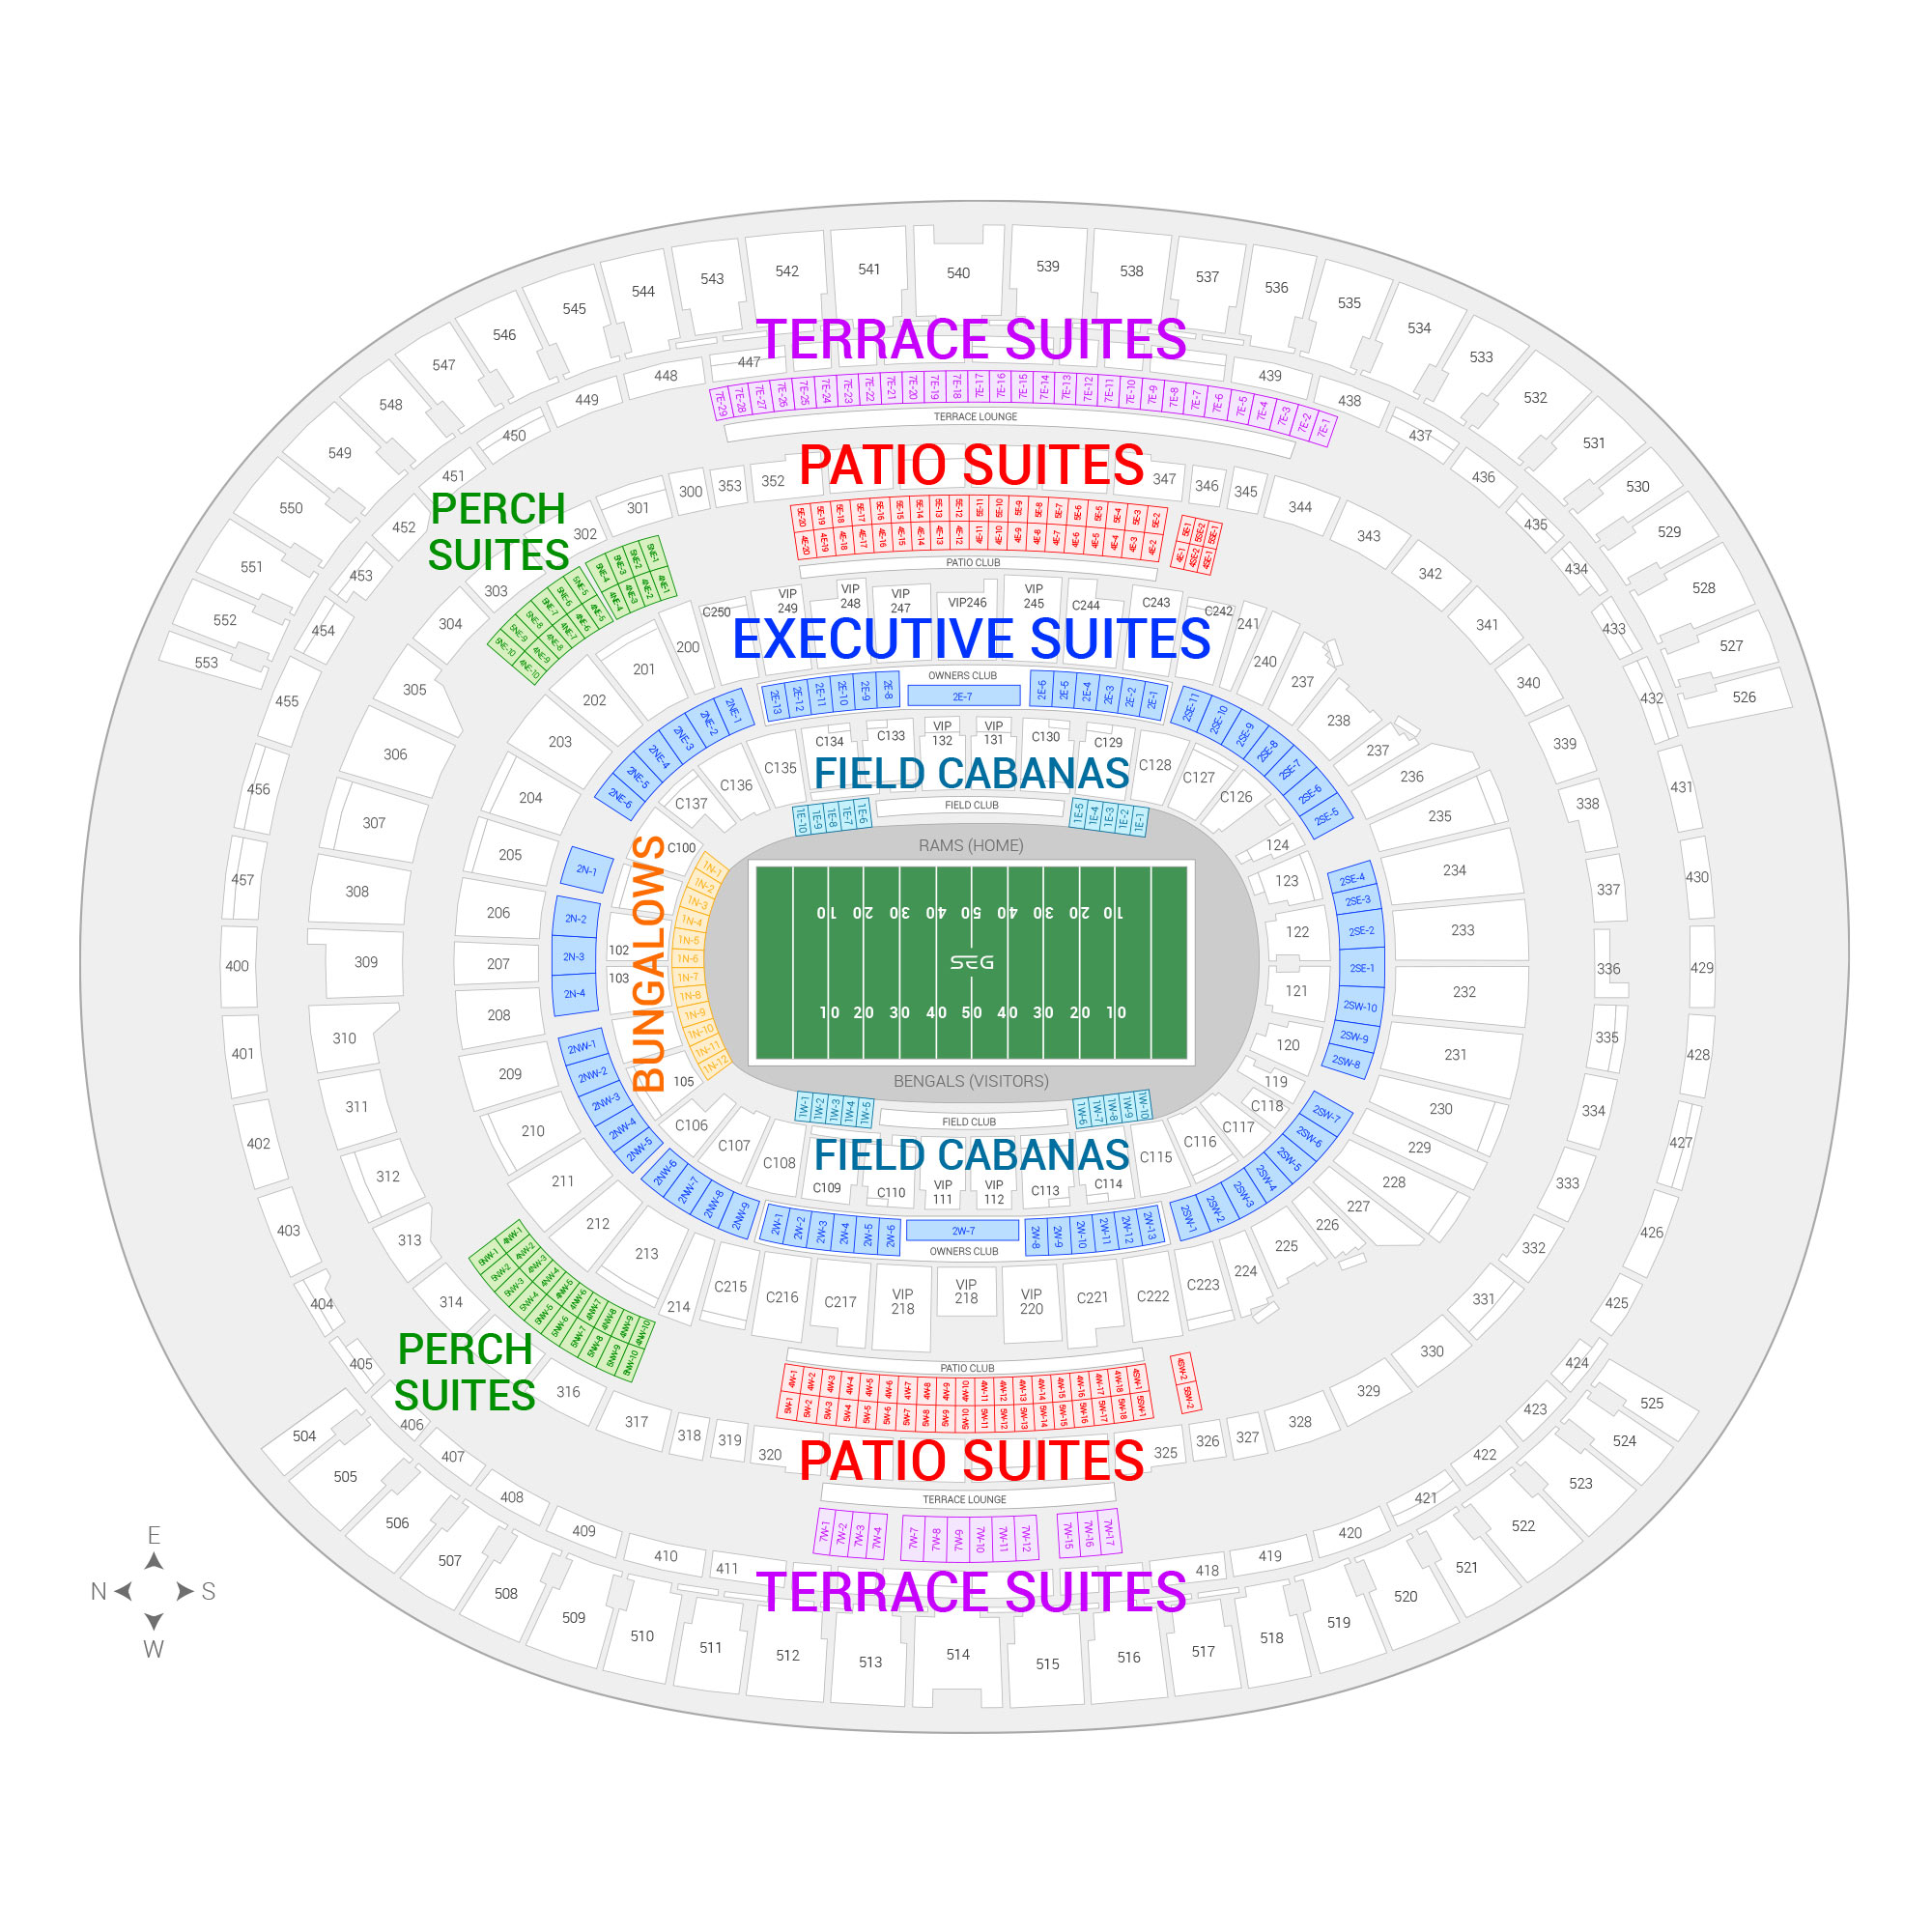 SoFi Stadium / Super Bowl LVI Suite Map and Seating Chart